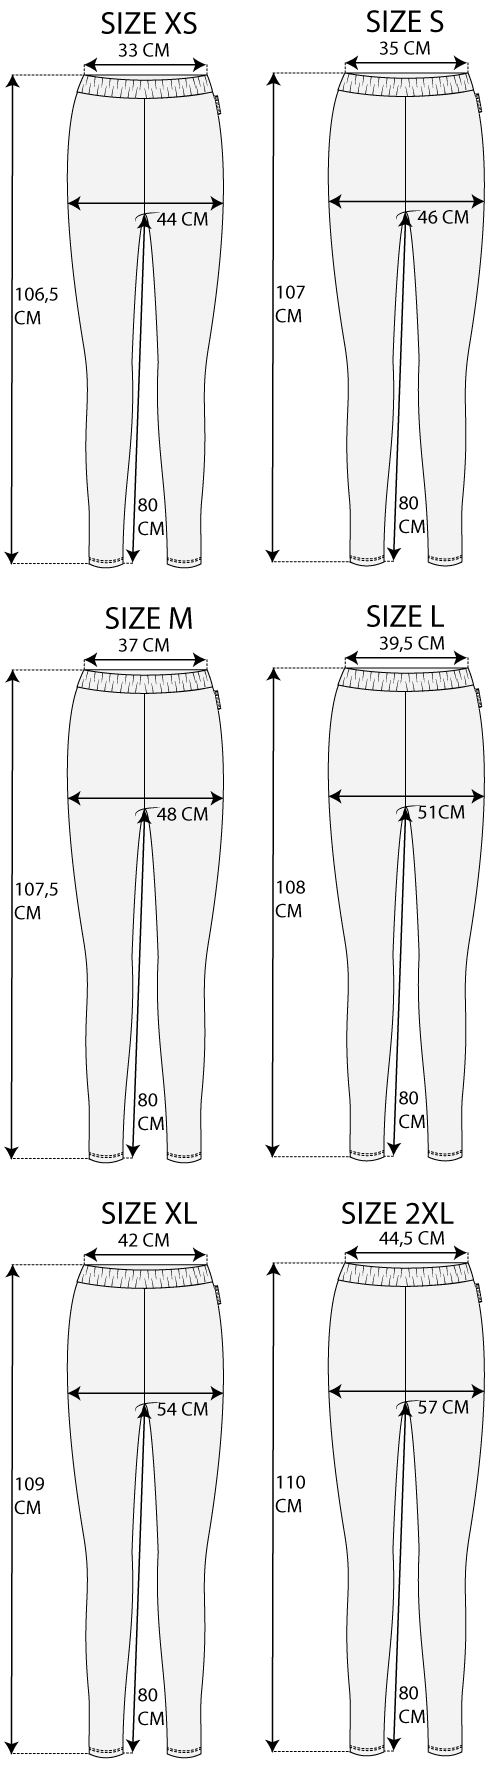 Maattabel Legging